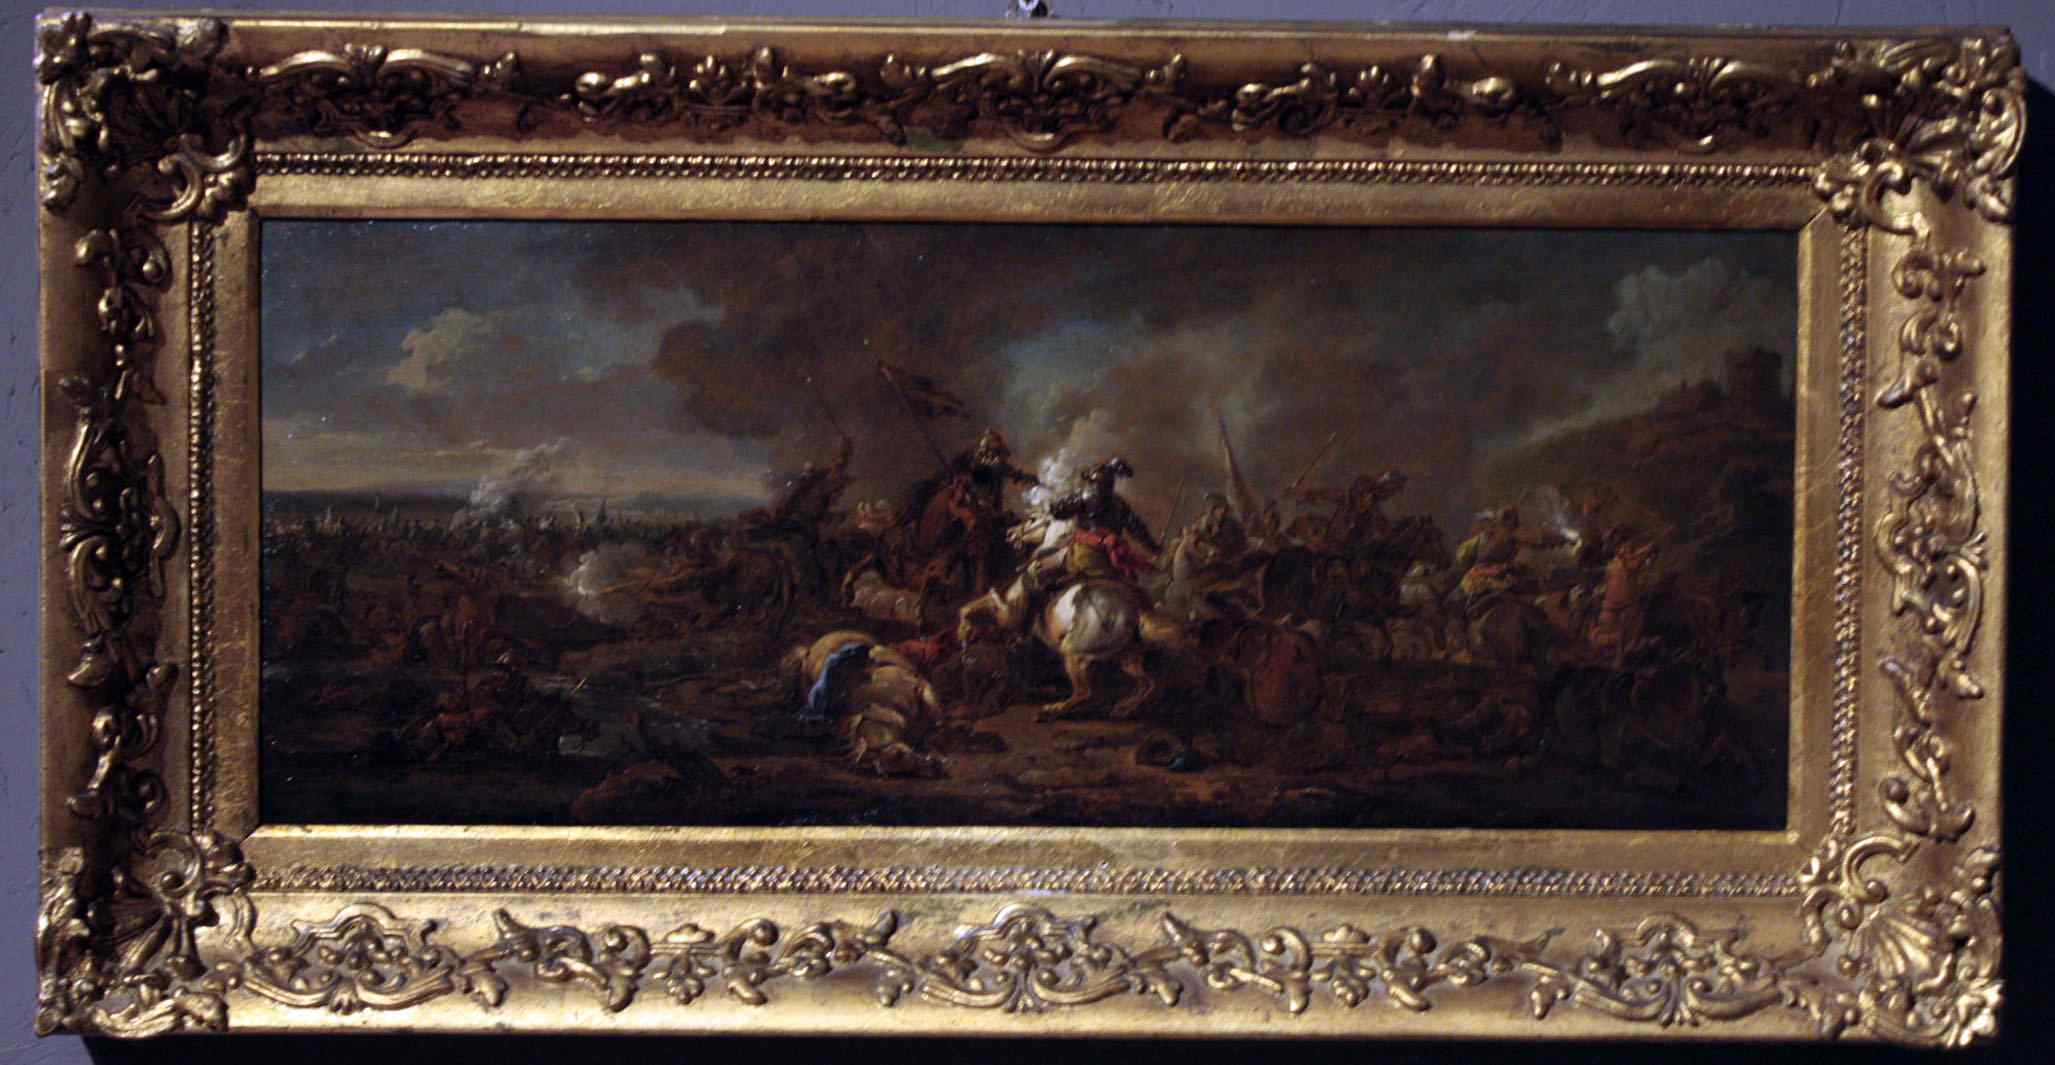 Филипс Вуверман (1619-1668) - сцена битвы